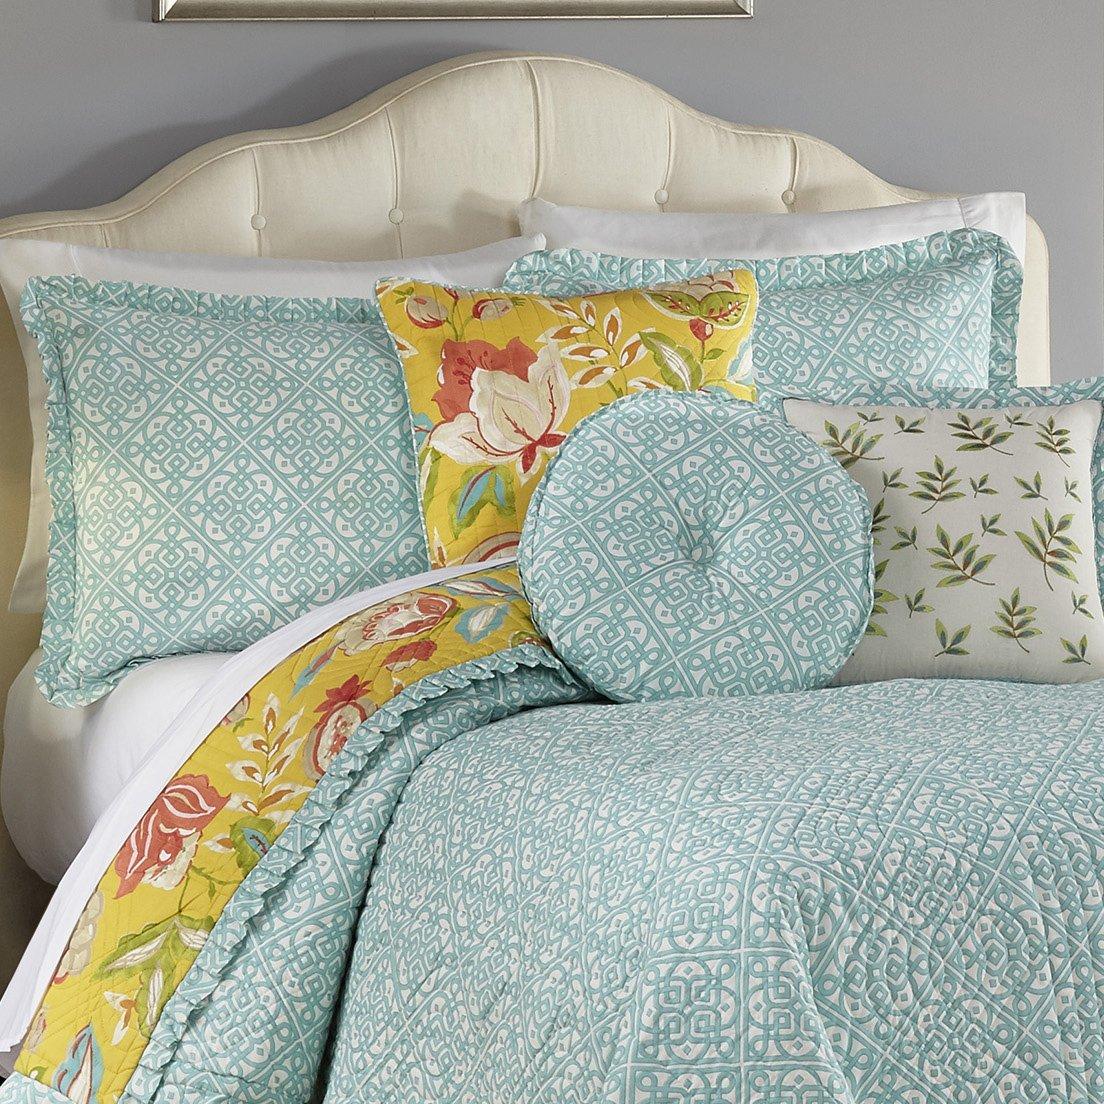 Sunshine Ellery Homestyles 16302BEDDF//QSSH WAVERLY Modern Poetic Quilt Collection Full//Queen